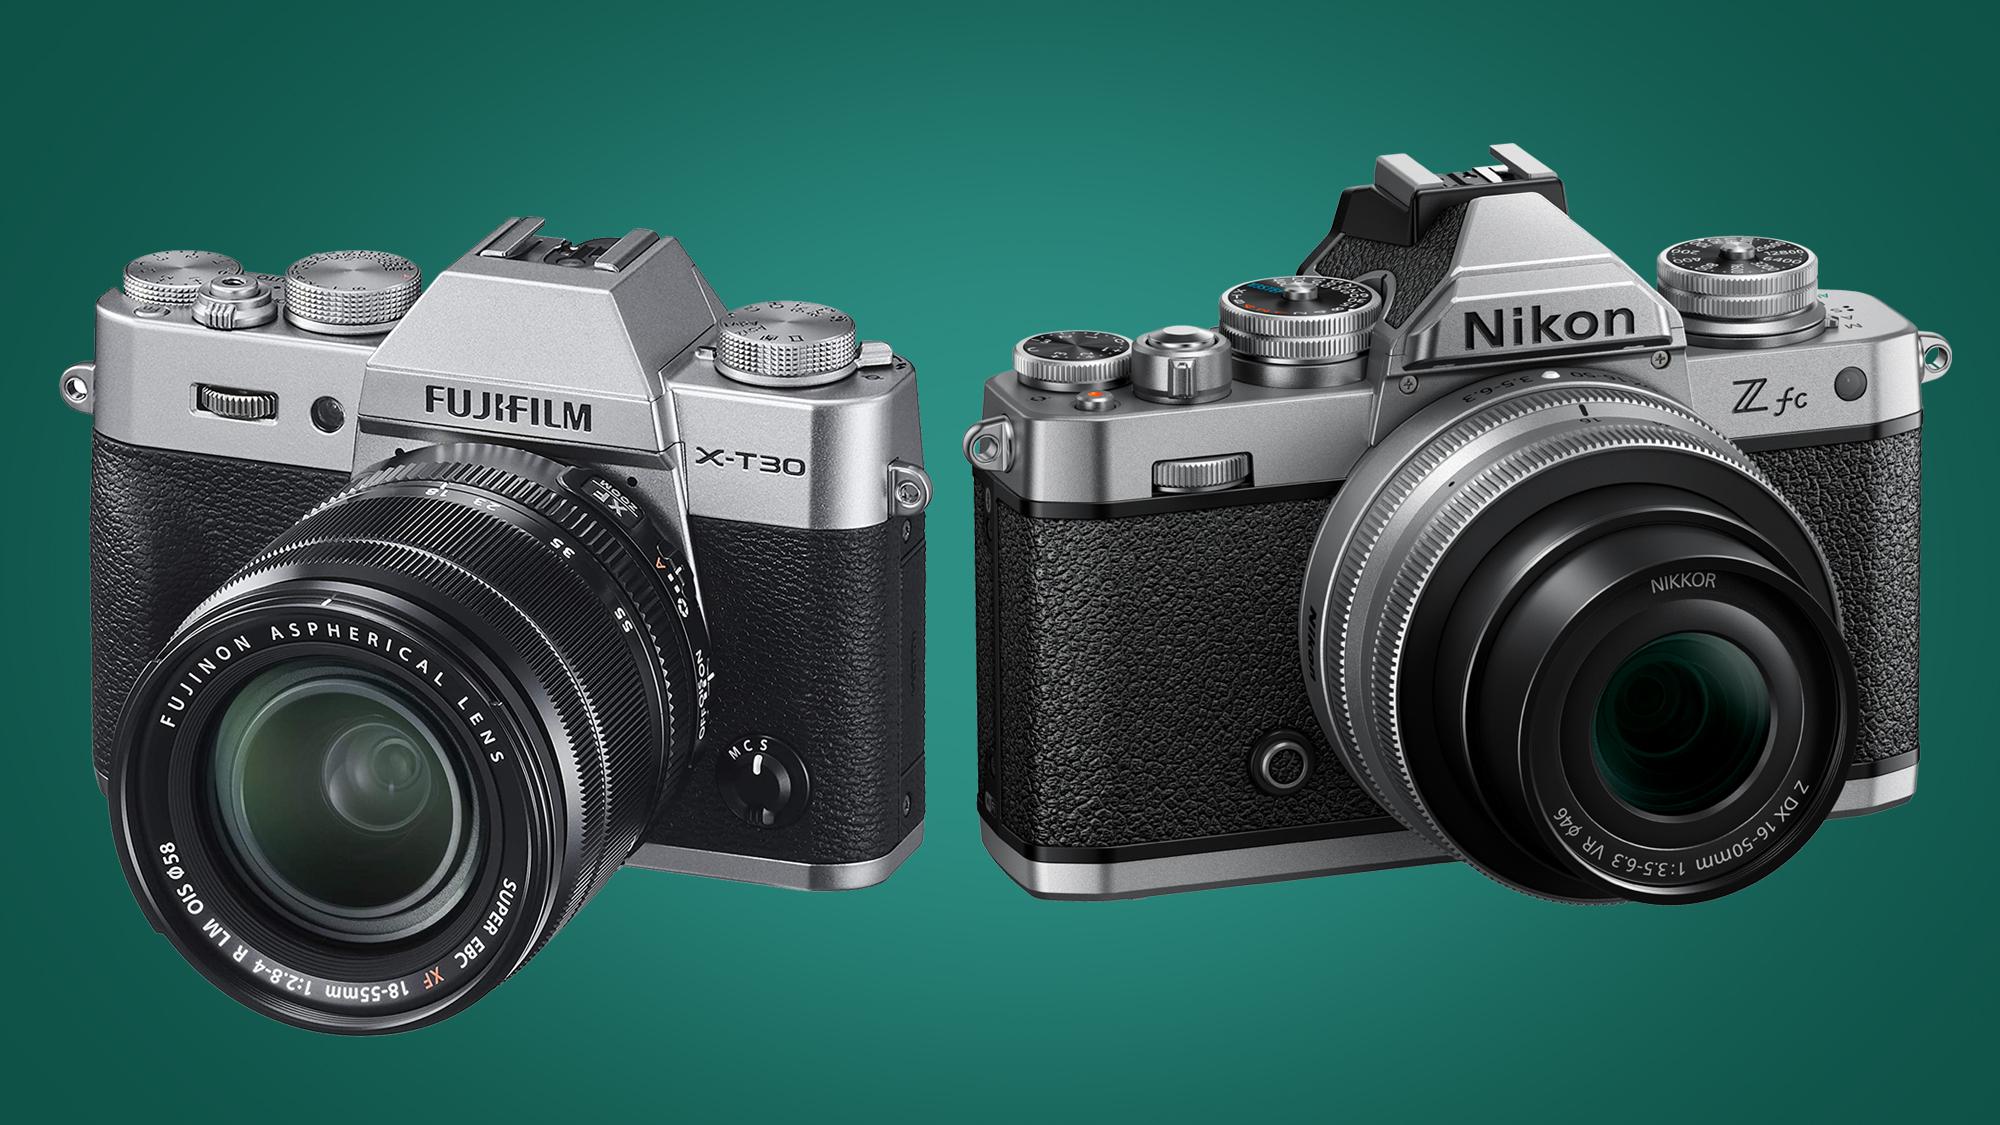 Image showing Fujifilm X-T30 next to Nikon Zfc